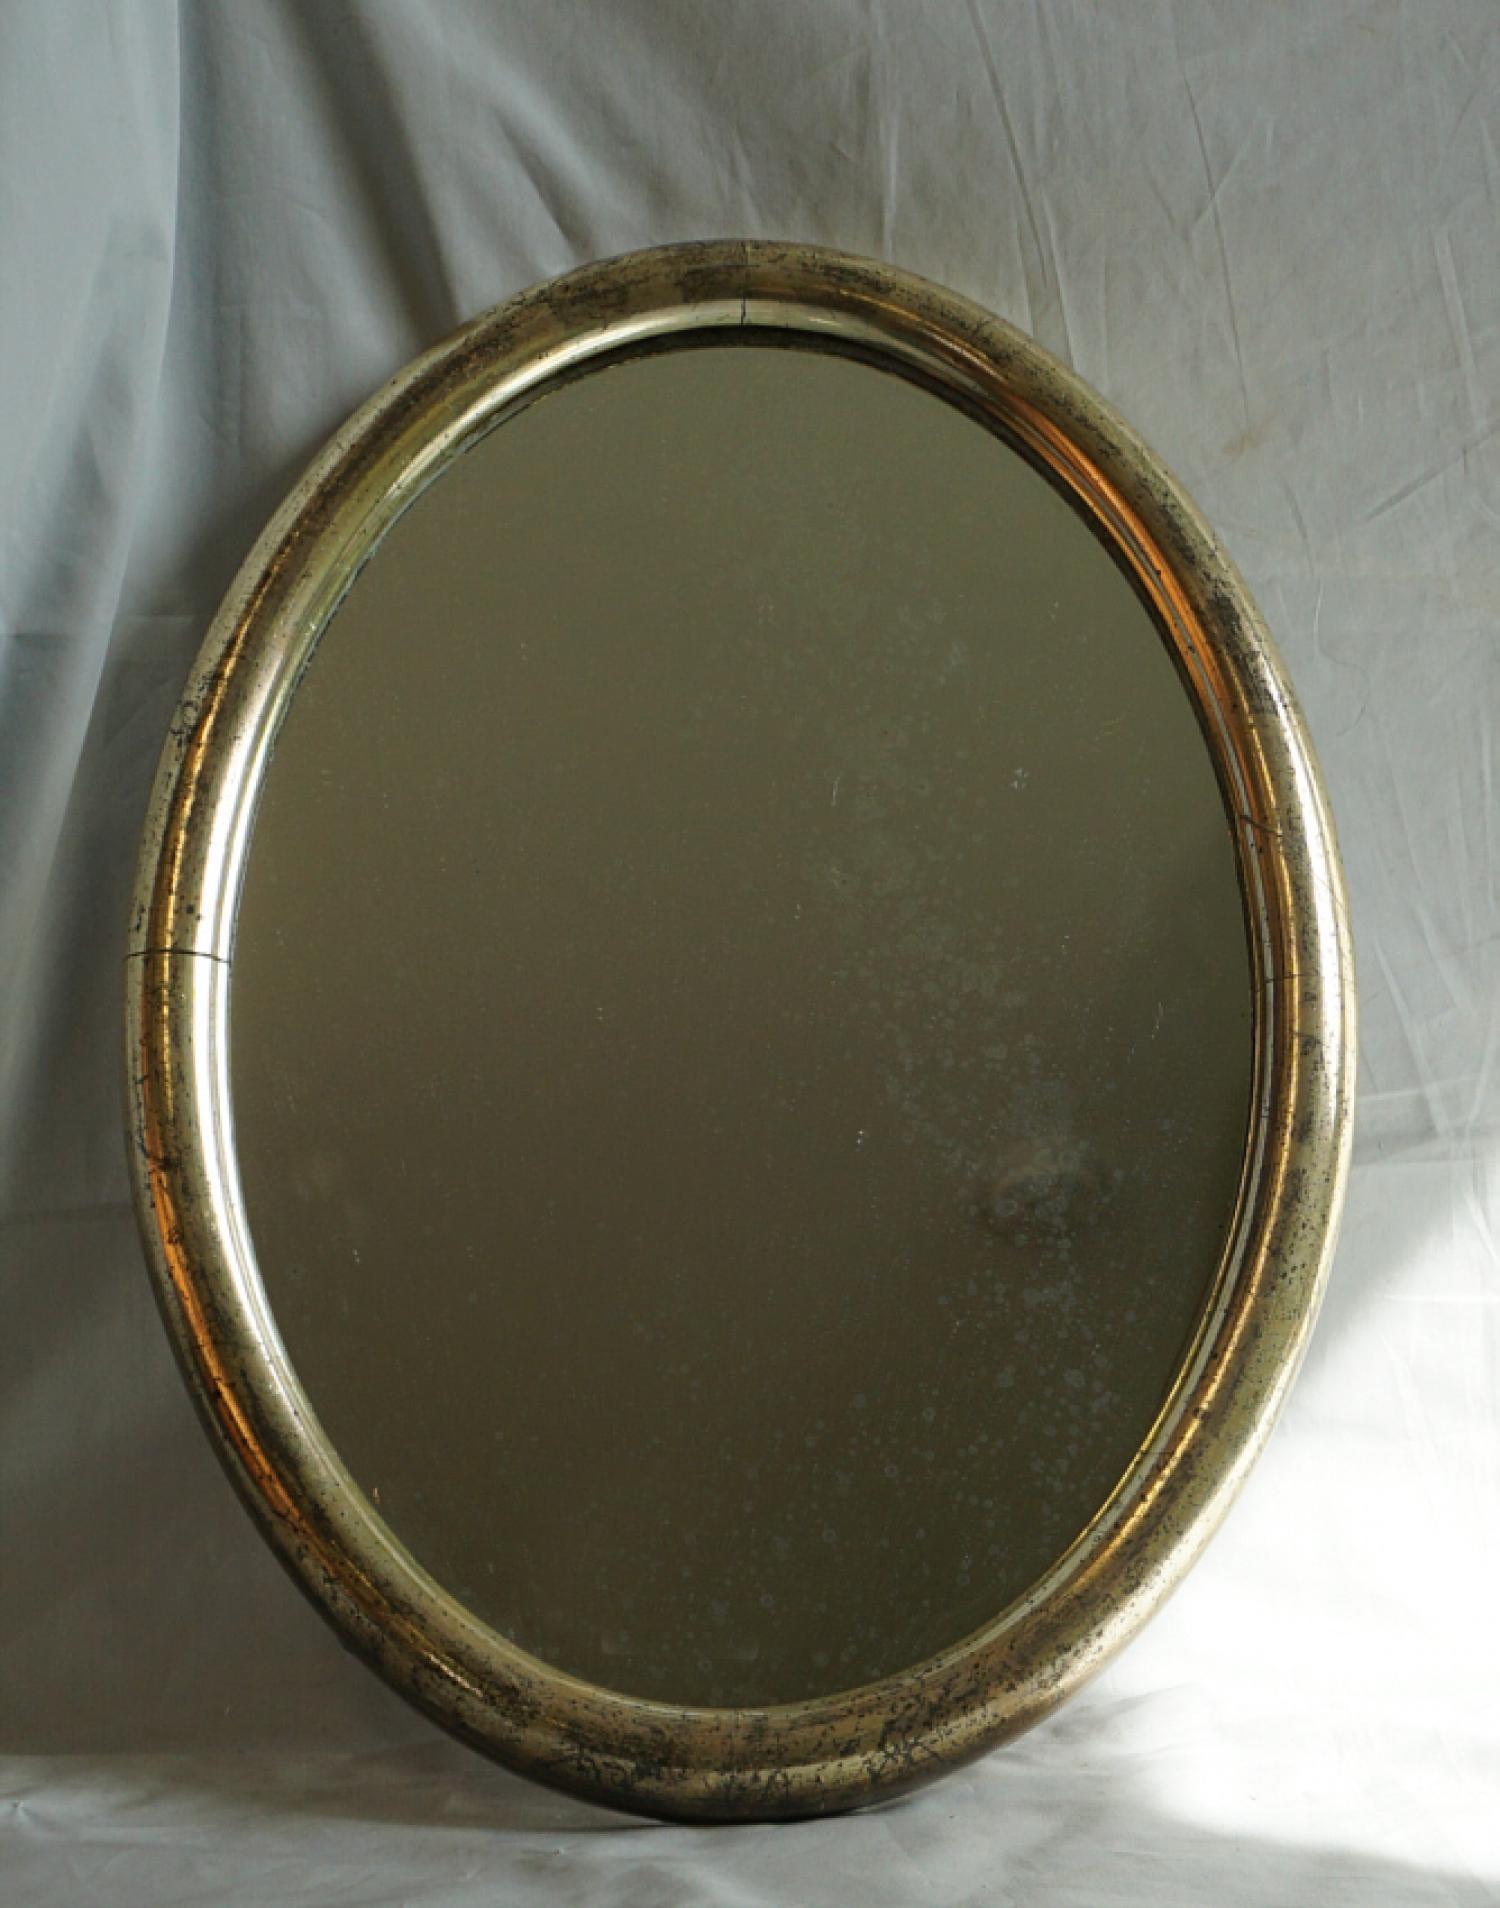 Antique oval mirror in original silver leaf c1870